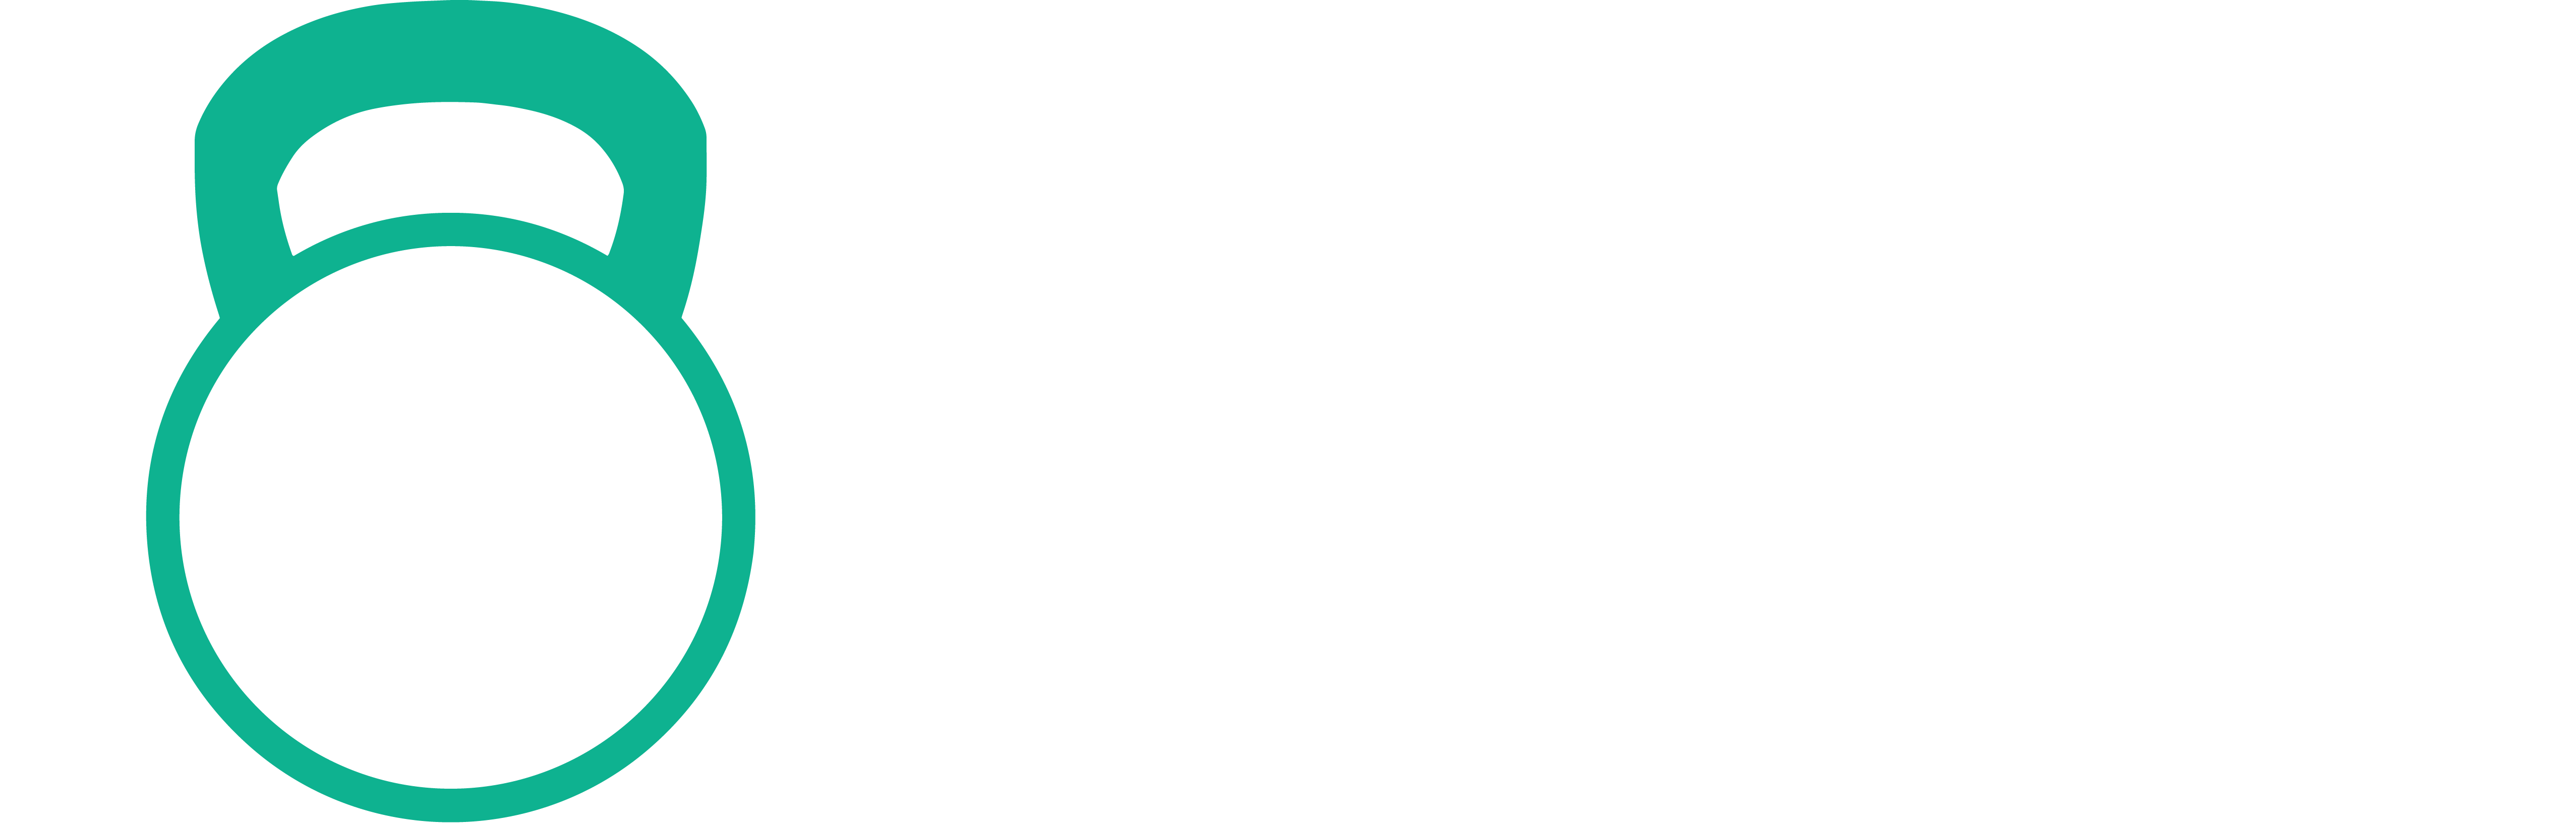 hanteln-fitness.de